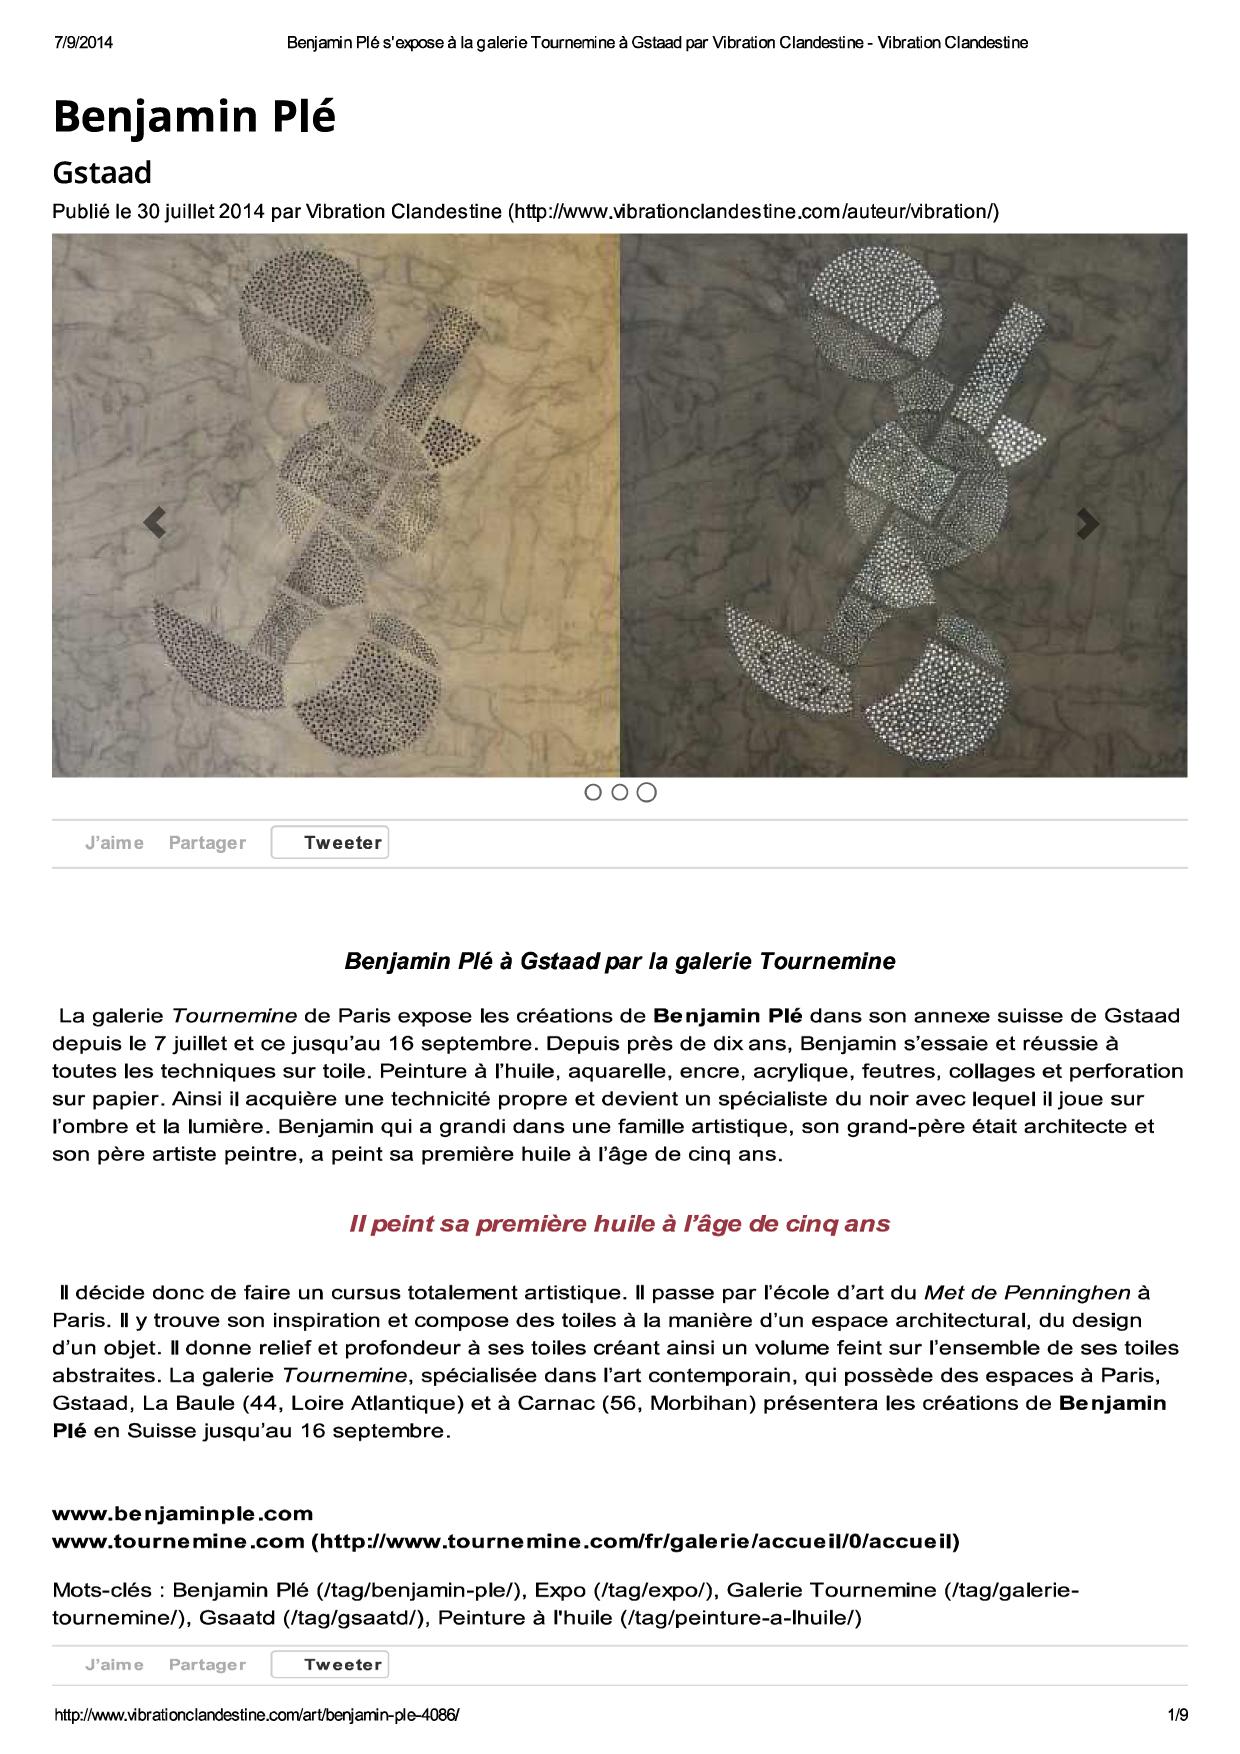 Article - Vibration Clandestine